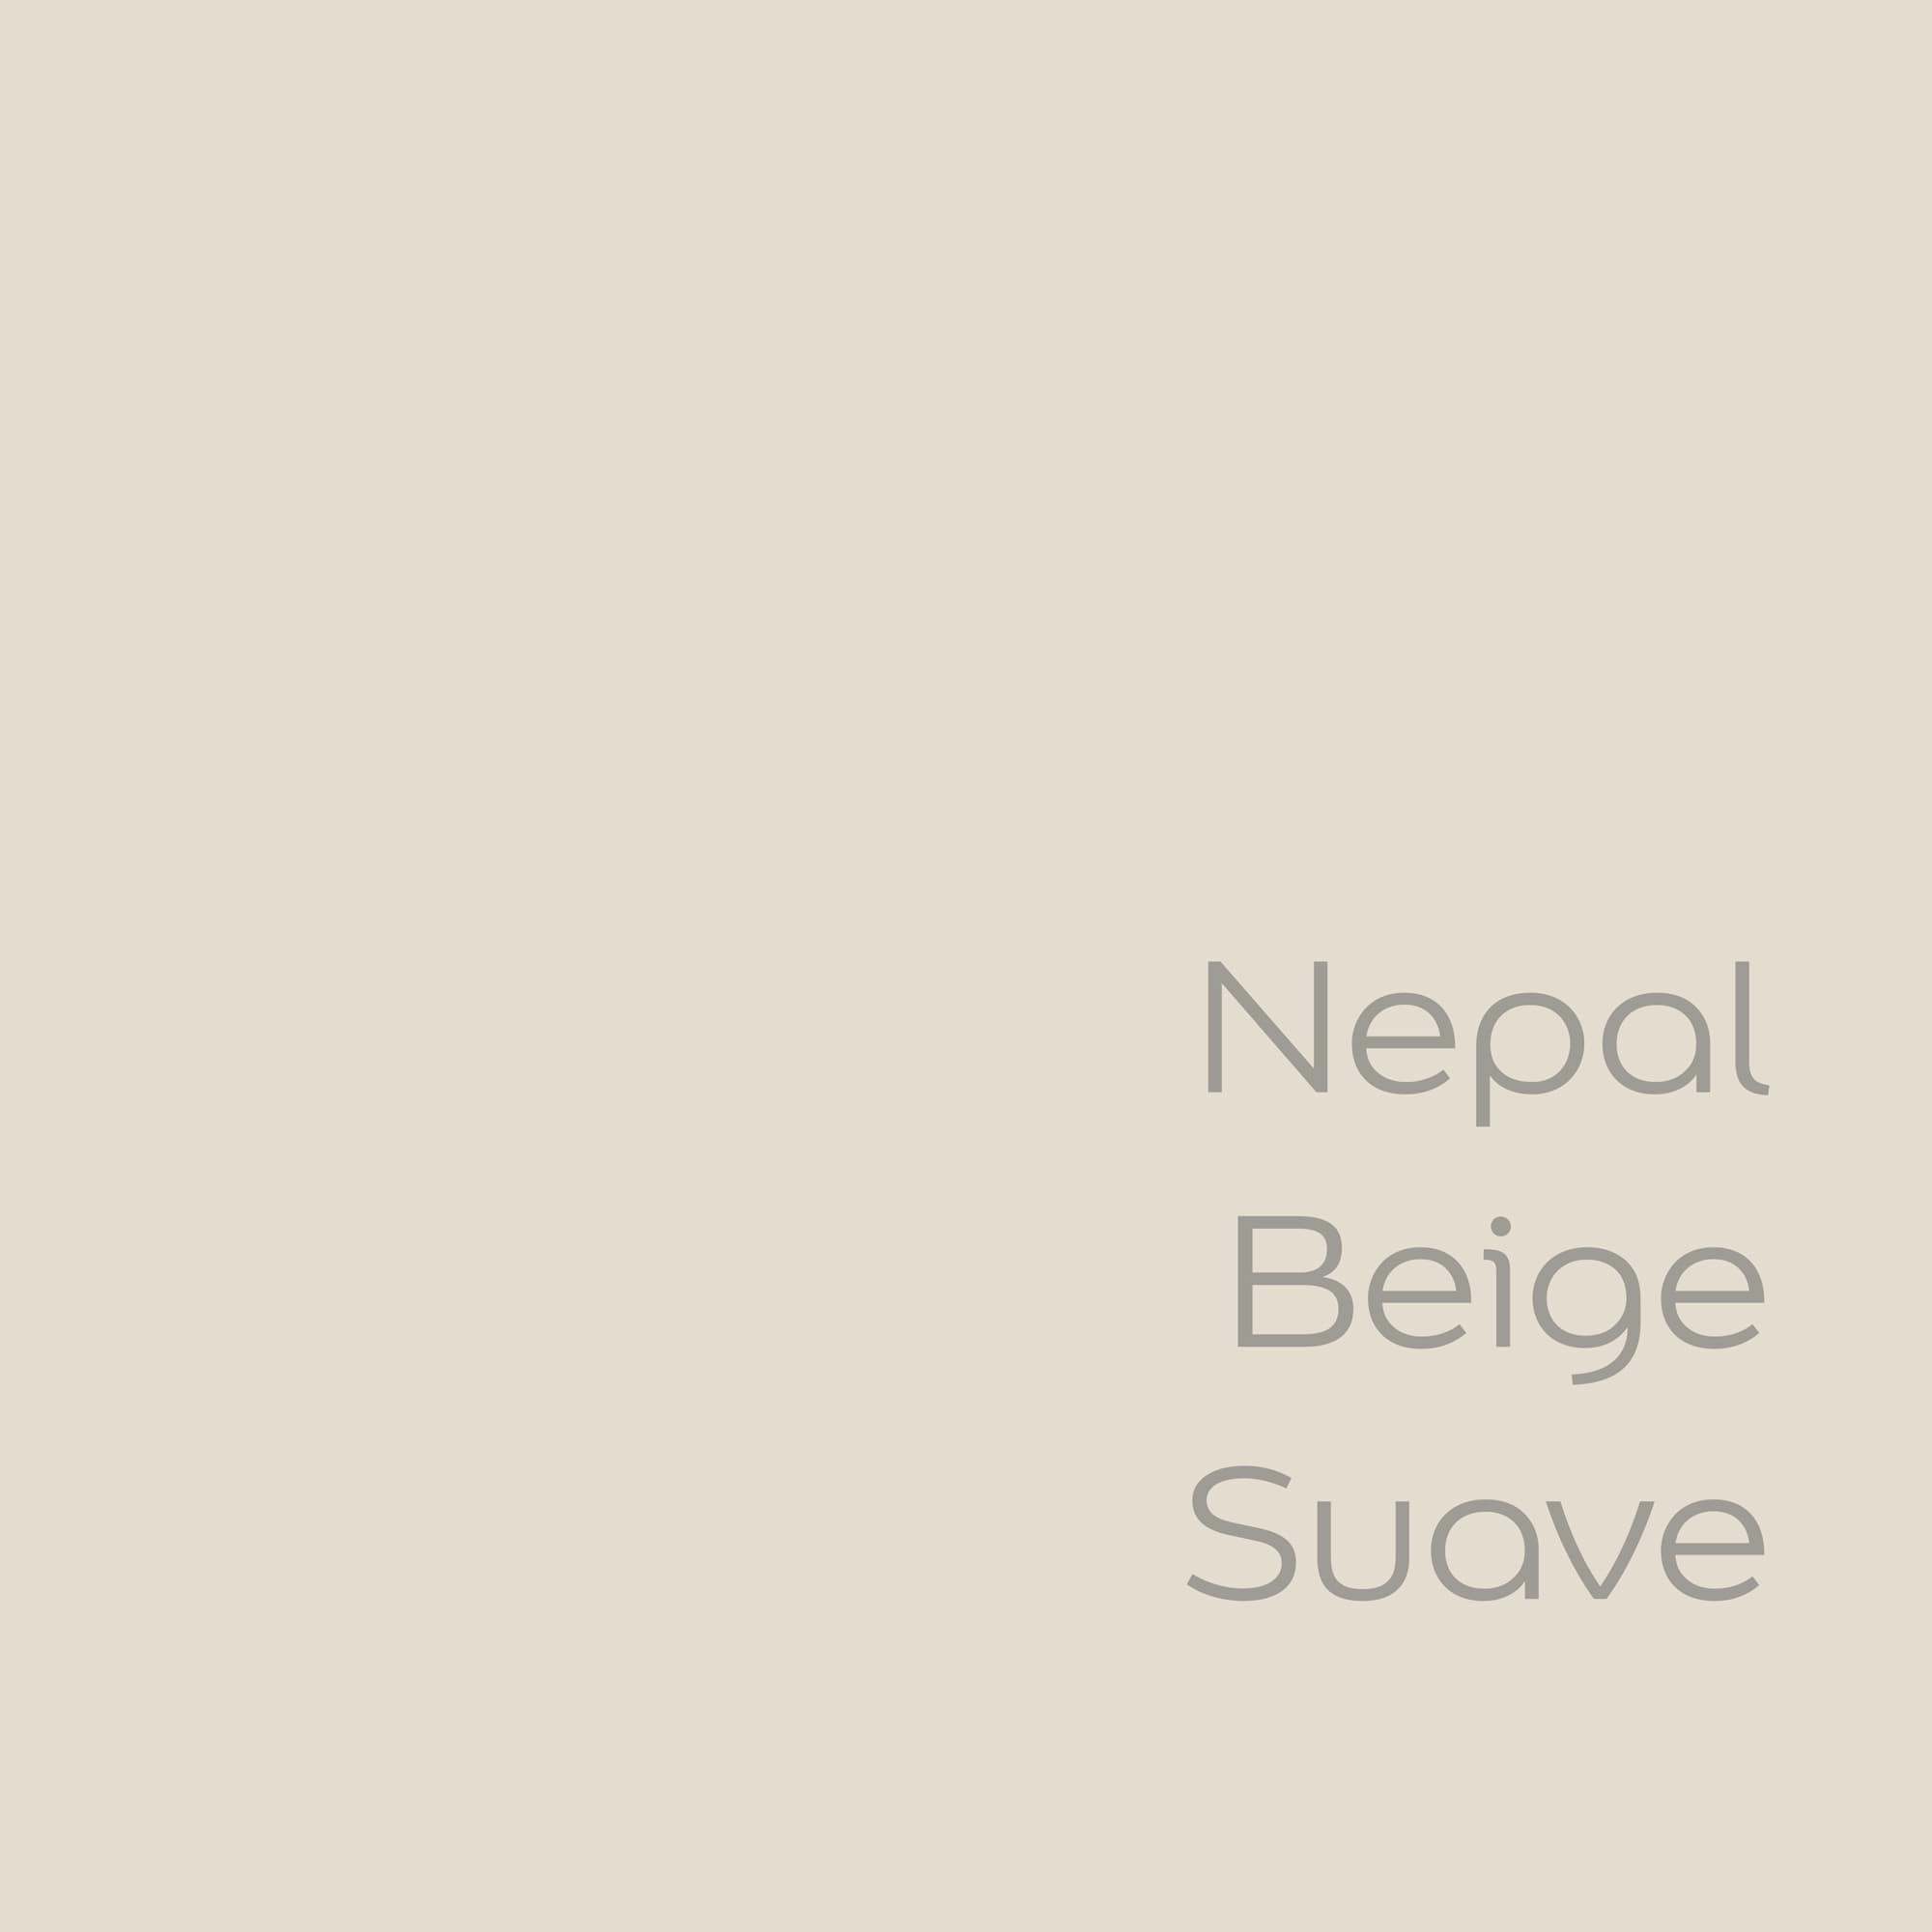 tester de color de pintura bruguer nepal beige suave color